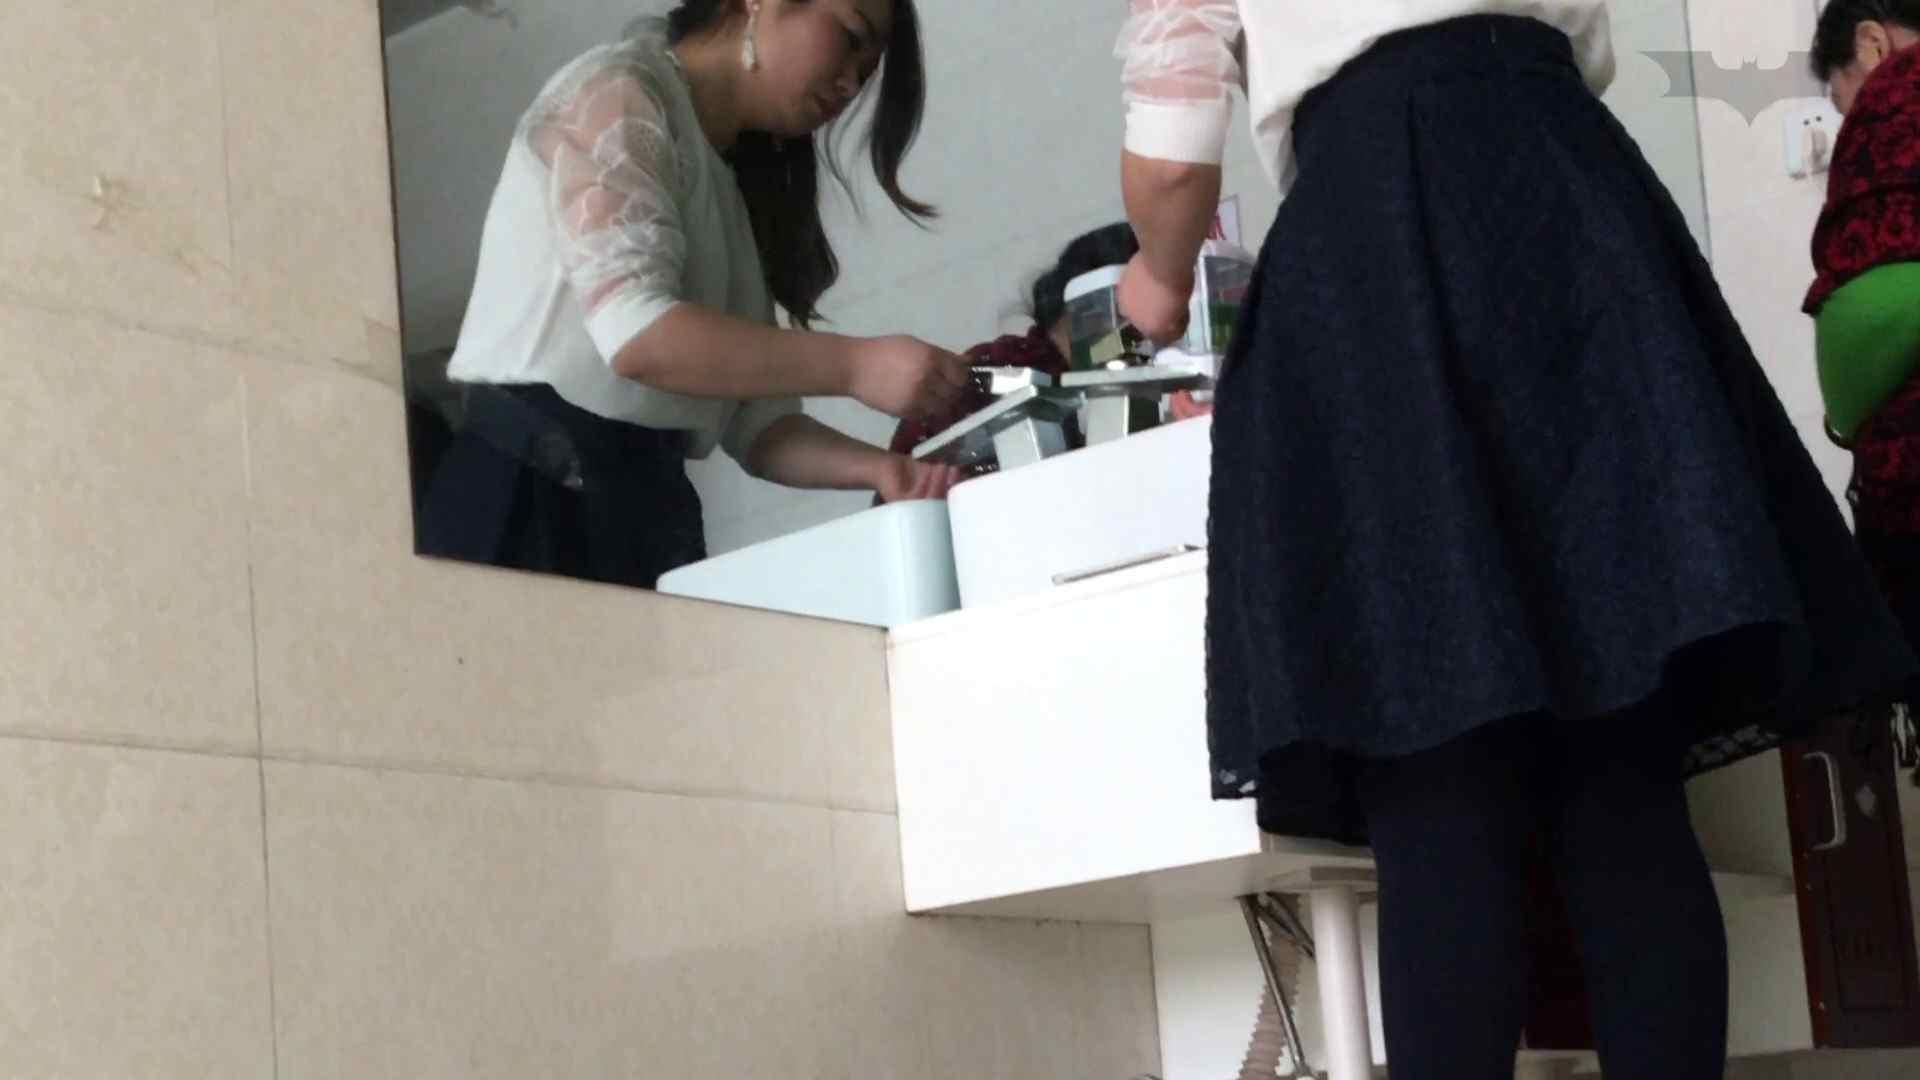 芸術大学ガチ潜入盗撮 JD盗撮 美女の洗面所の秘密 Vol.111 細身女性 セックス画像 96画像 75